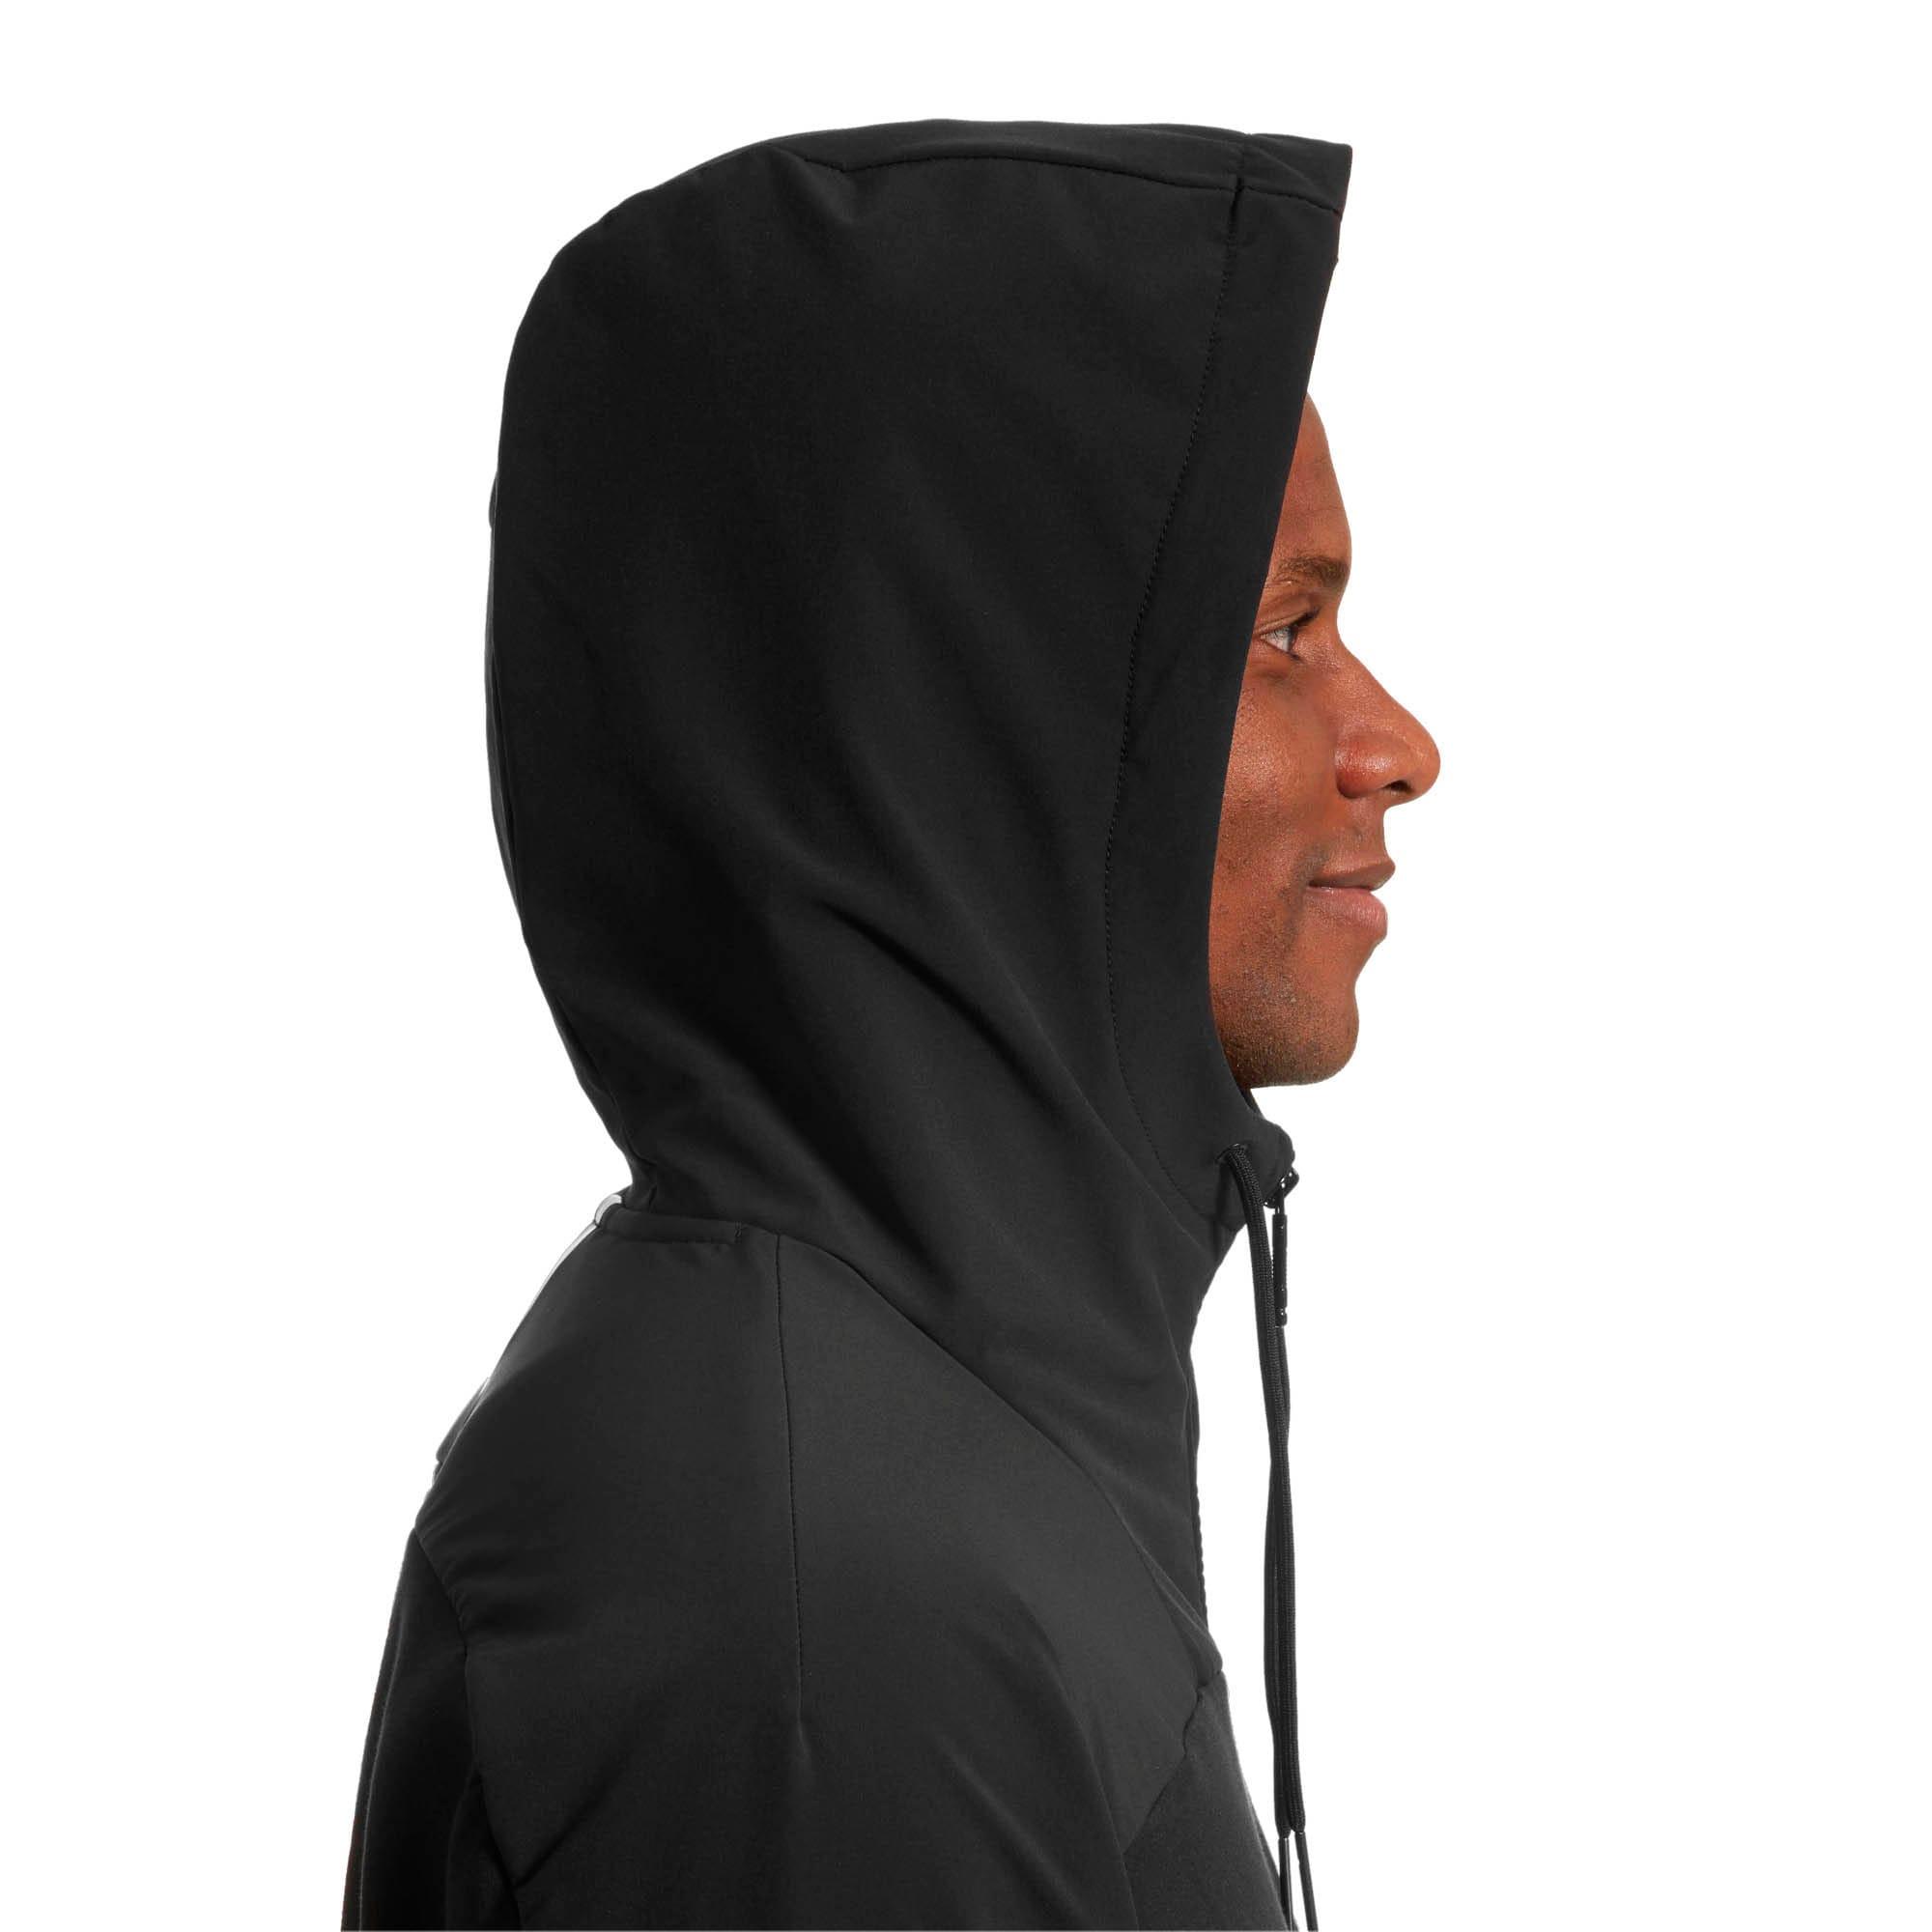 Thumbnail 4 of Pace LAB Men's Full Zip Hoodie, Puma Black, medium